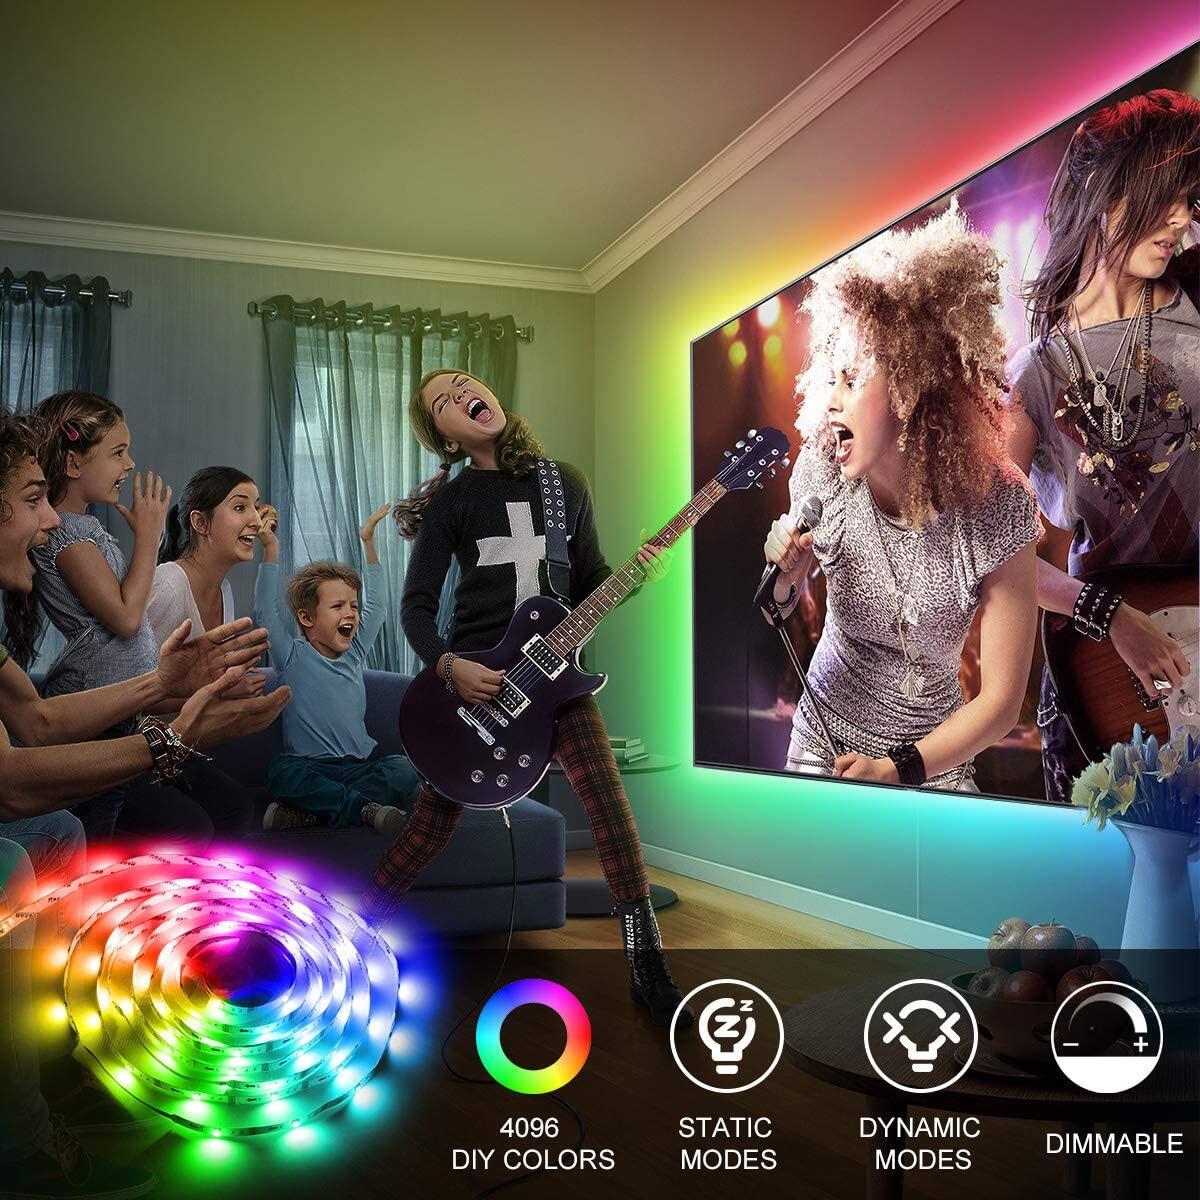 TV LED Backlight 6.56ft-13ft 5050 RGB LED Strip Lights with Remote for 32-70in TV 5V USD LED Tape Light 4096 Colors Changing LED Light Strip for Monitor Theater Home Bedroom Desk Ambient Light